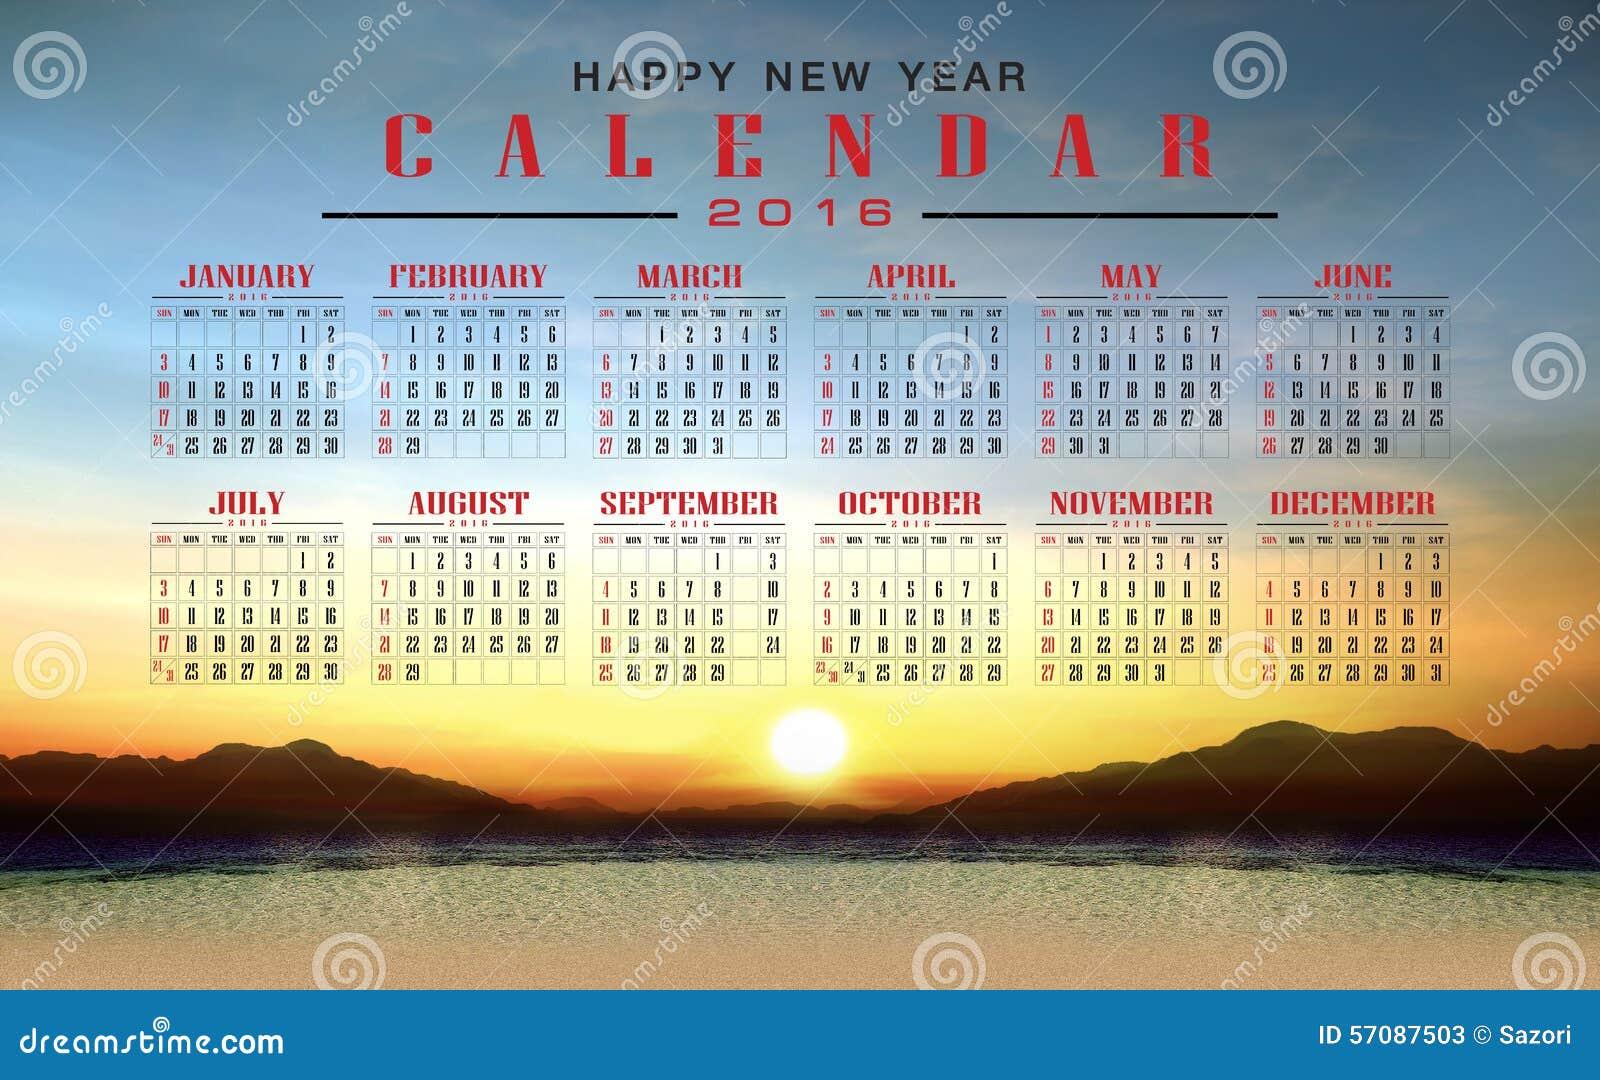 Happy New Year Calendar : Calendar and happy new year stock illustration